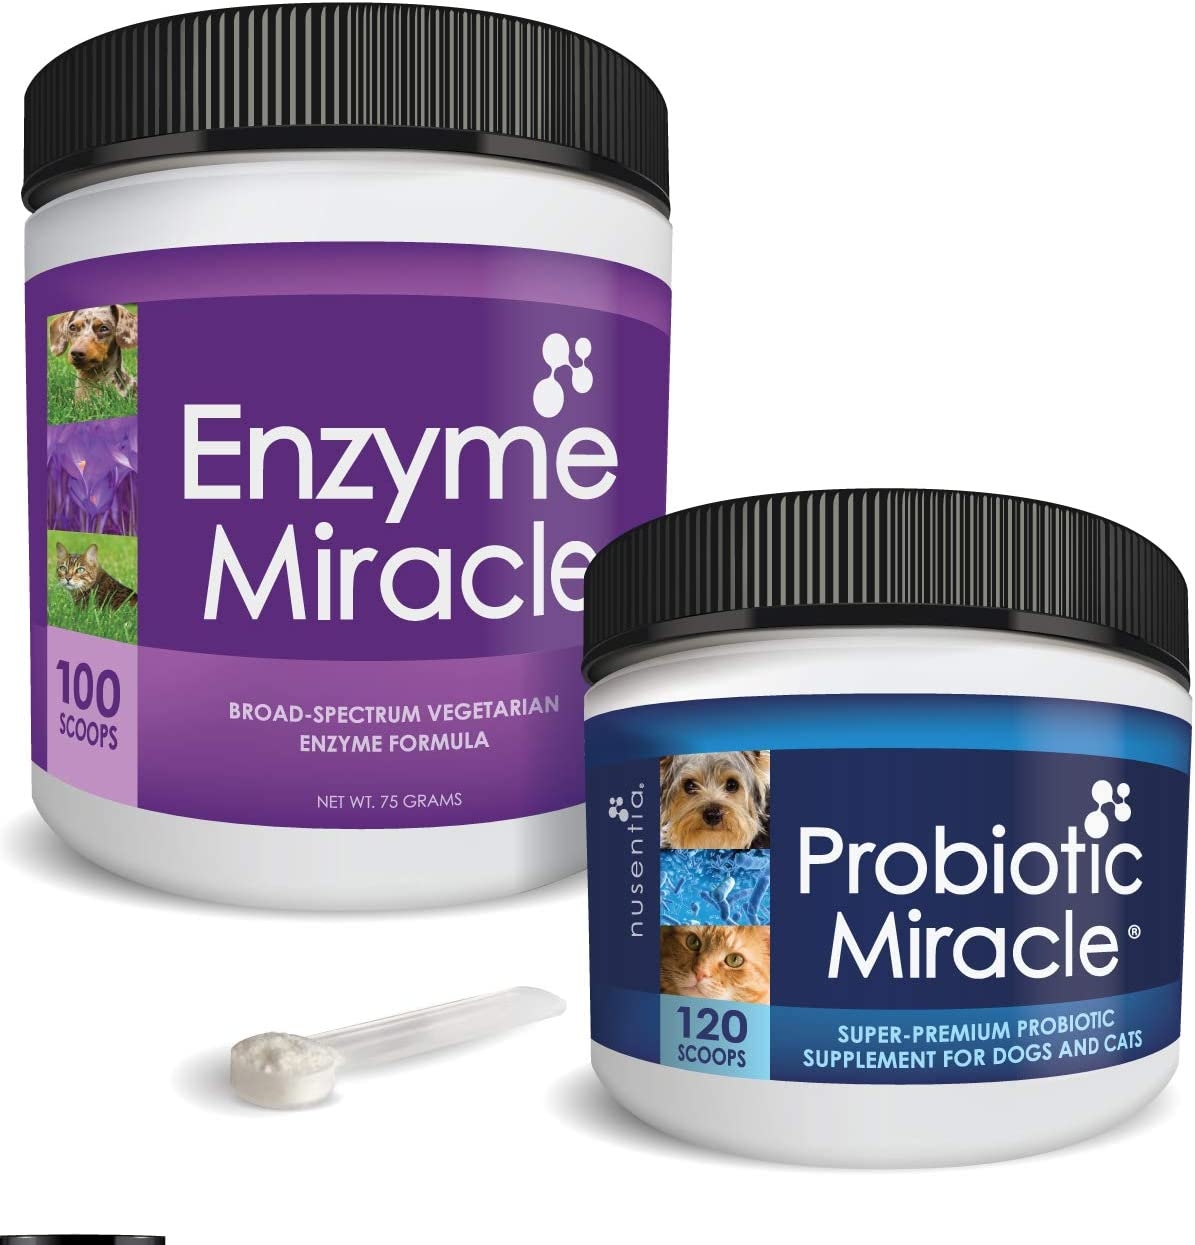 NUSENTIA The Miracle Pack - Natural Probiotics + Digestive Enzymes - Prebiotics - for Diarrhea, Gas, Loose Stool, Digestive Upset, & Allergies